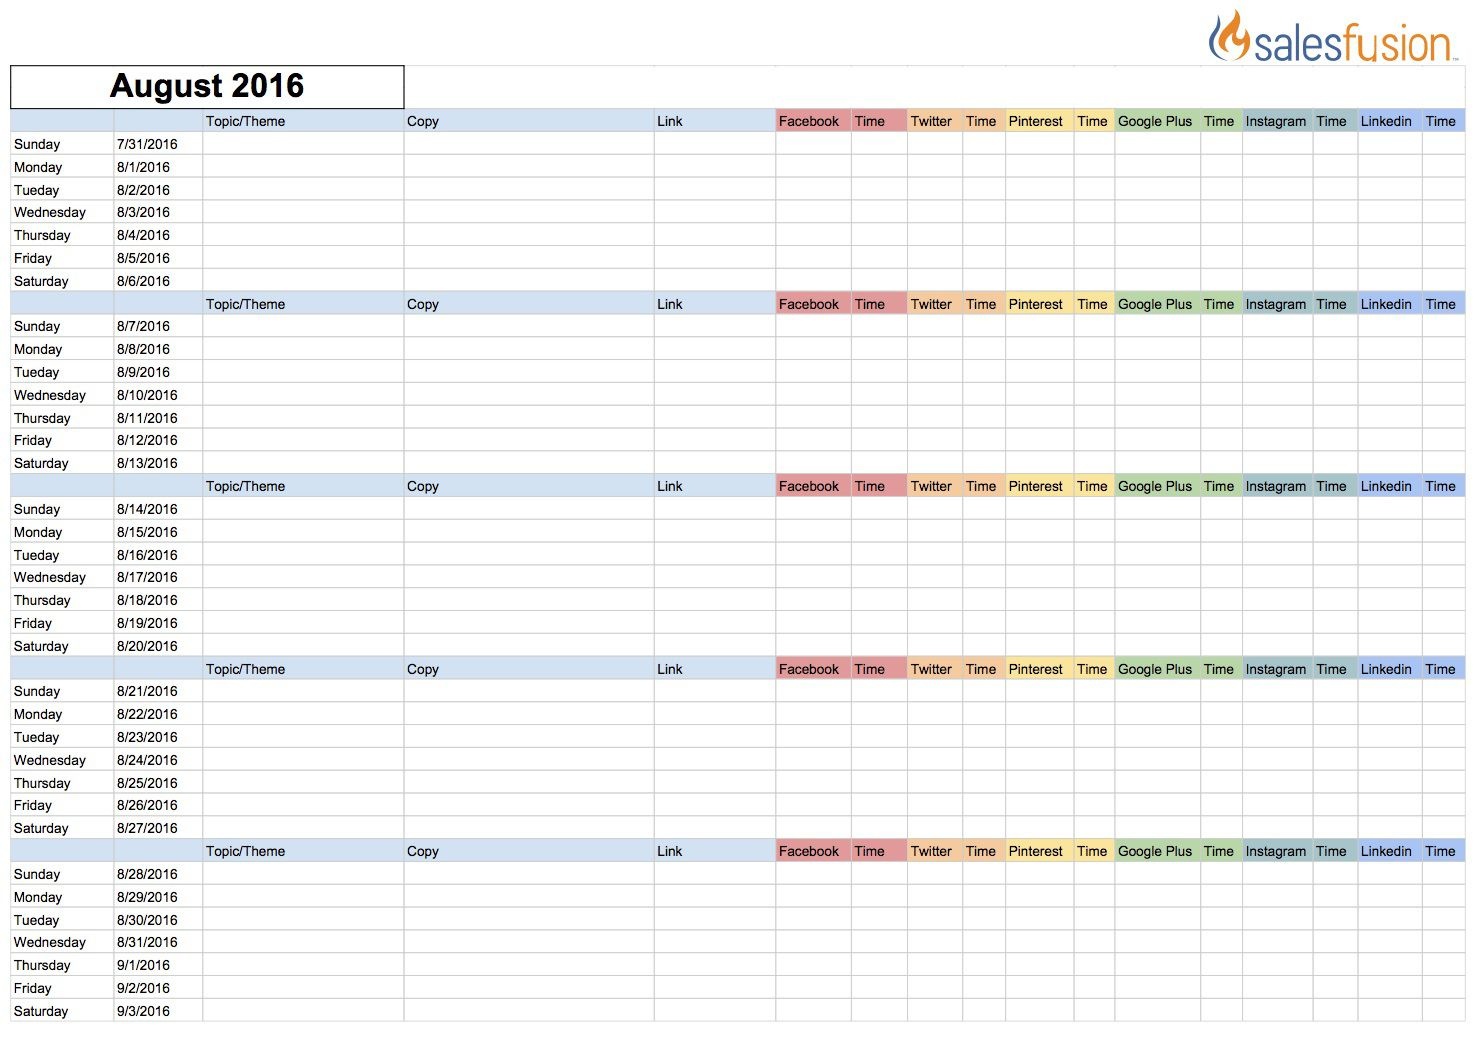 002 Fascinating Social Media Editorial Calendar Template Concept  Content Excel 2020 Free DownloadFull